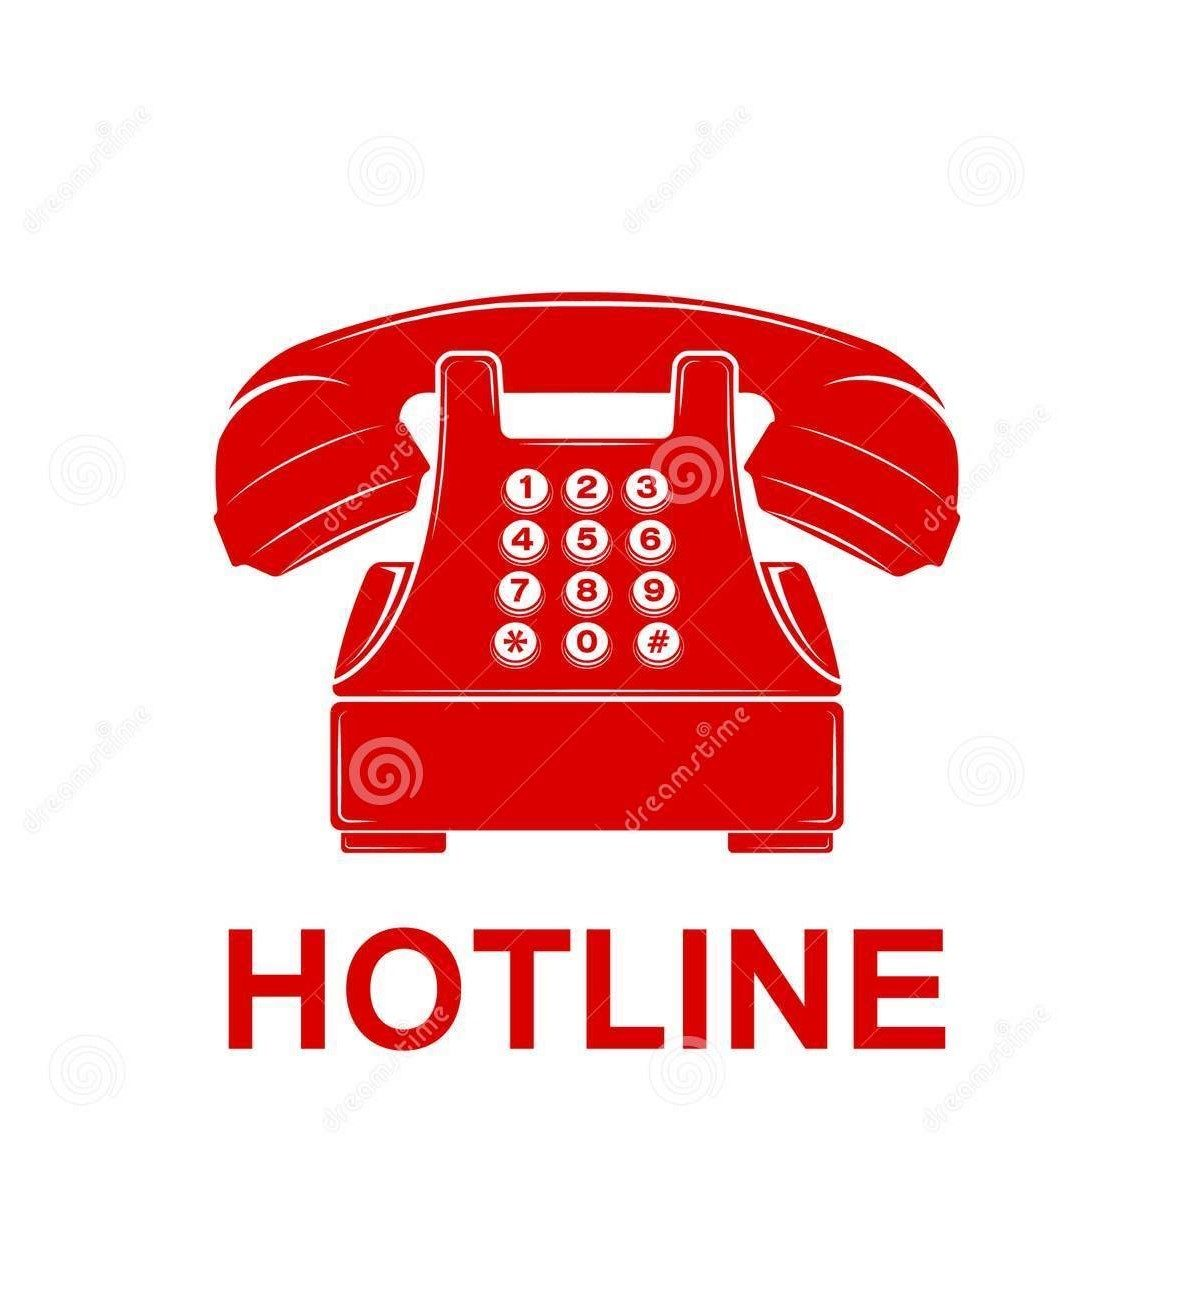 Hotline: 0964619789